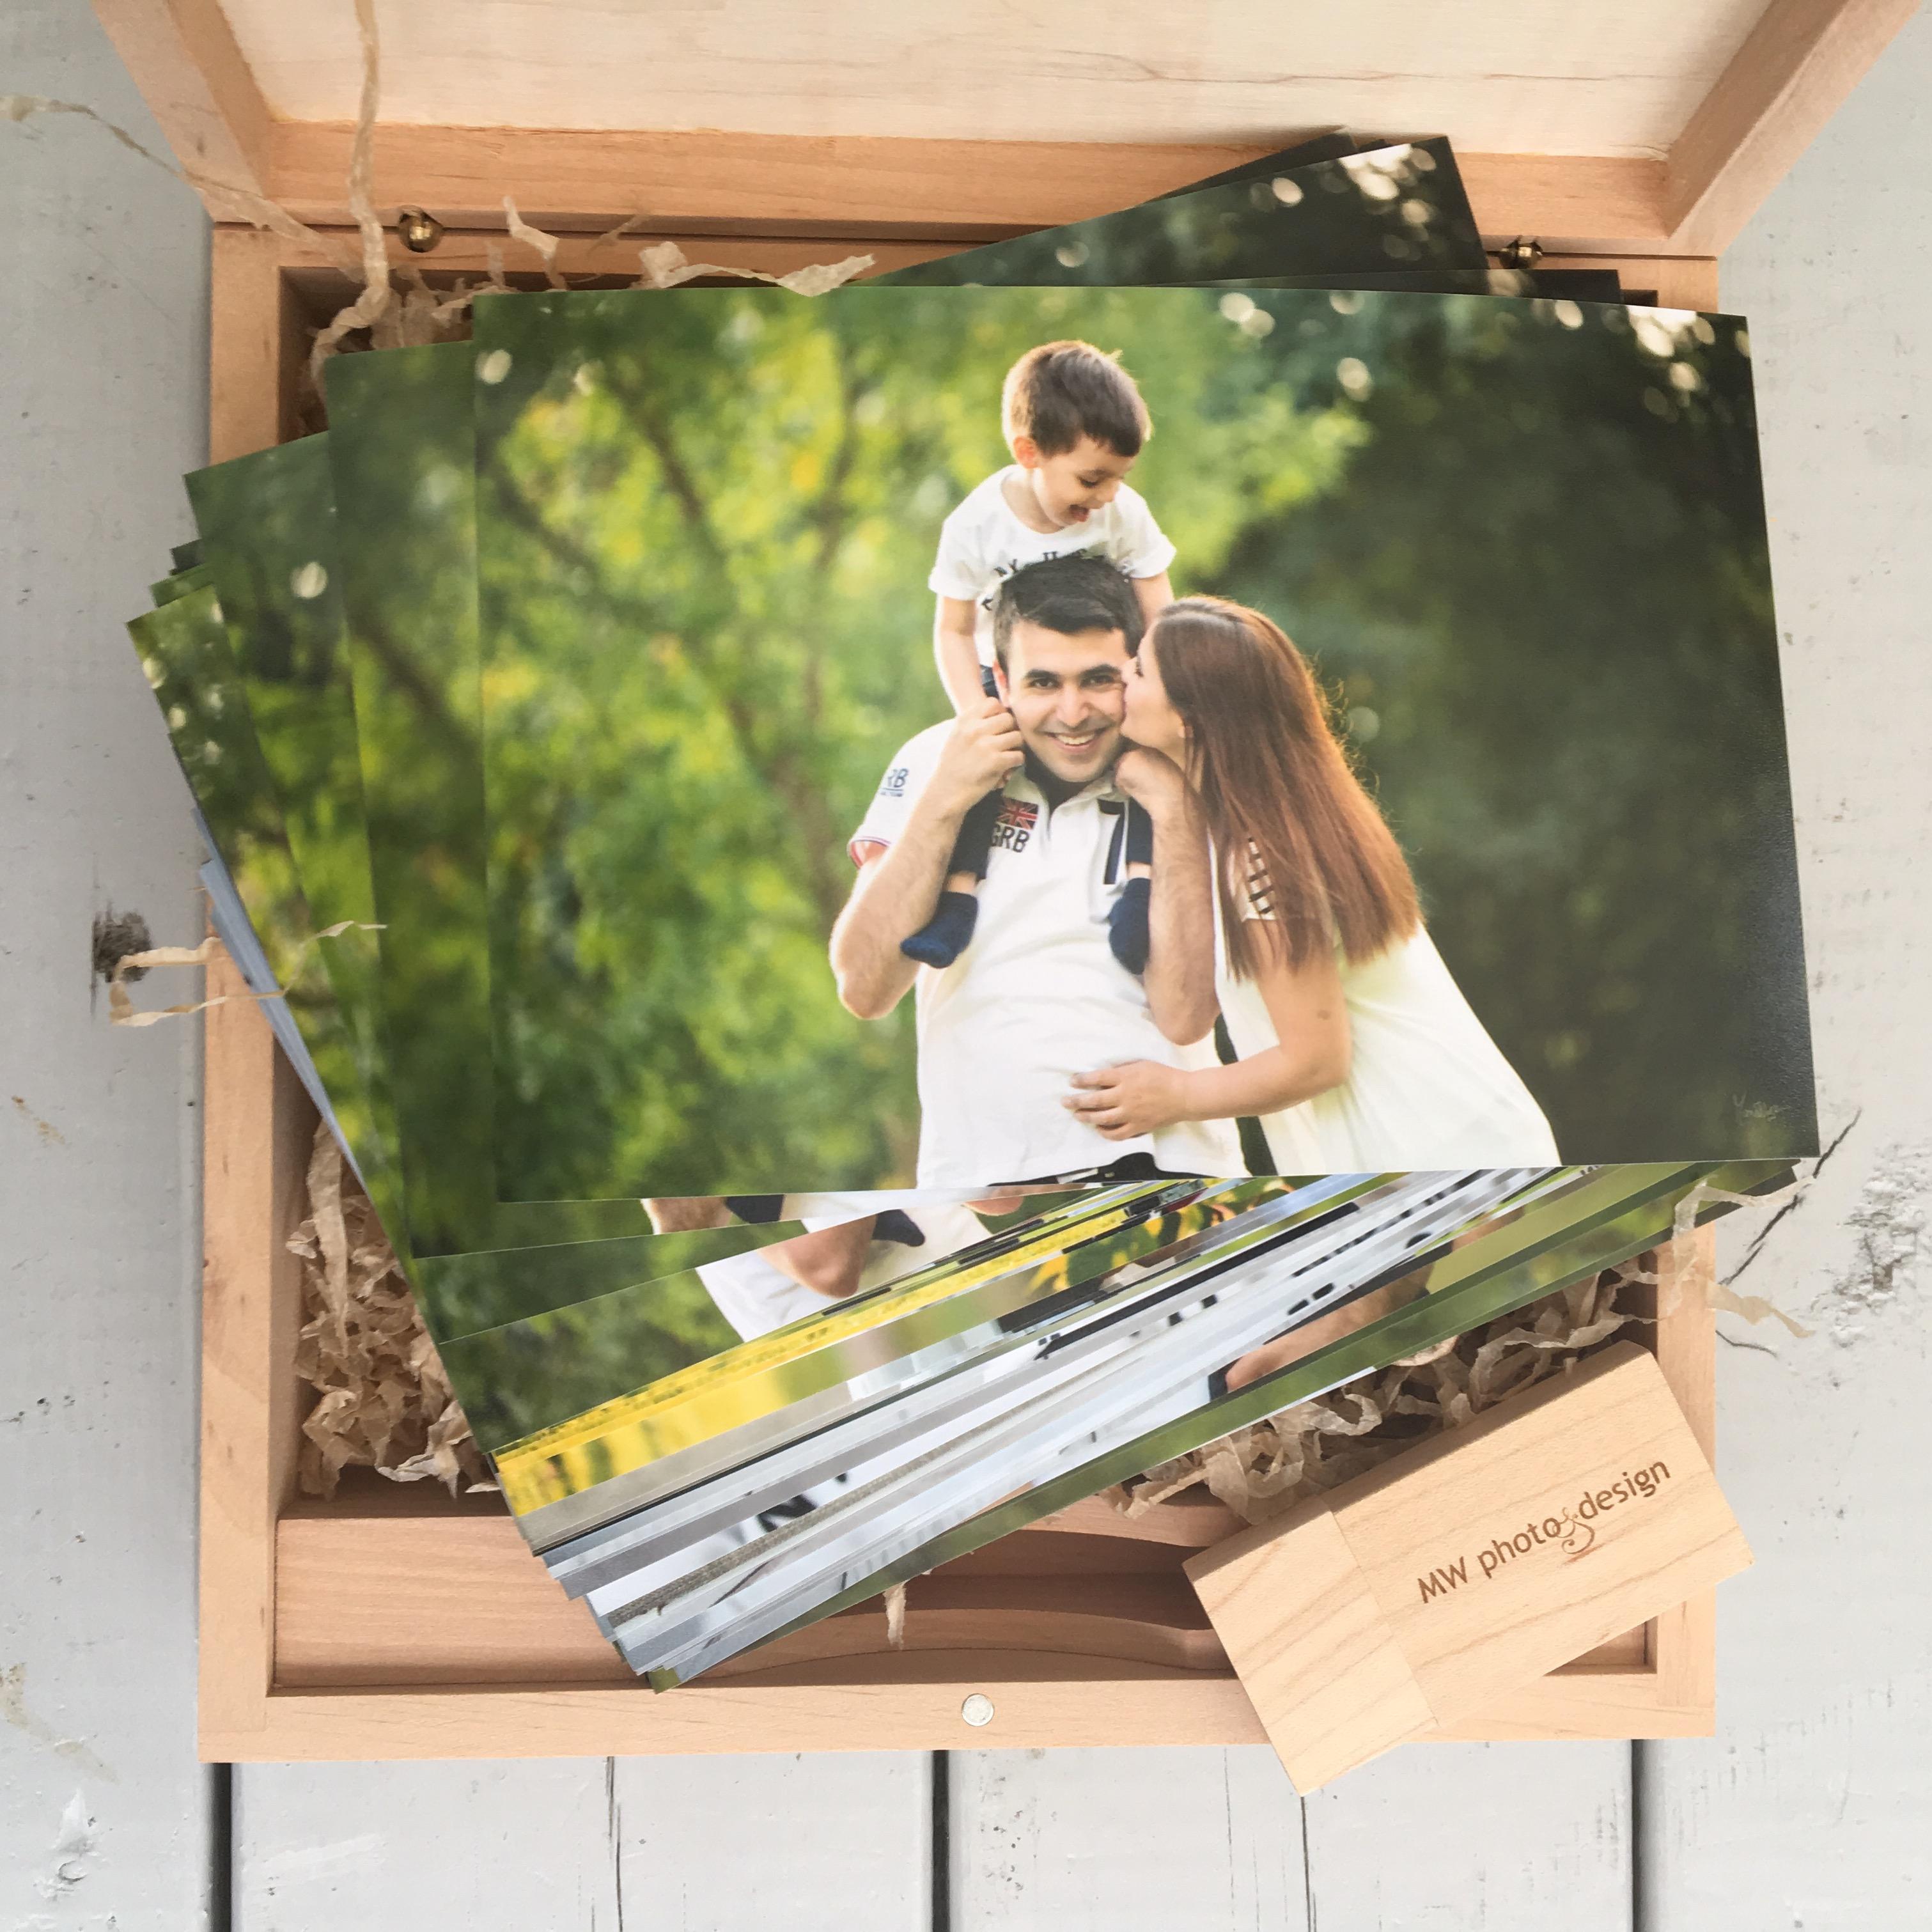 barnfotograf, familjefotograf, porträttfotograf, fotostudio, fotoatelje, skåne, ramlösa. helsingborg, fotograf, marie walther, mw photo&design